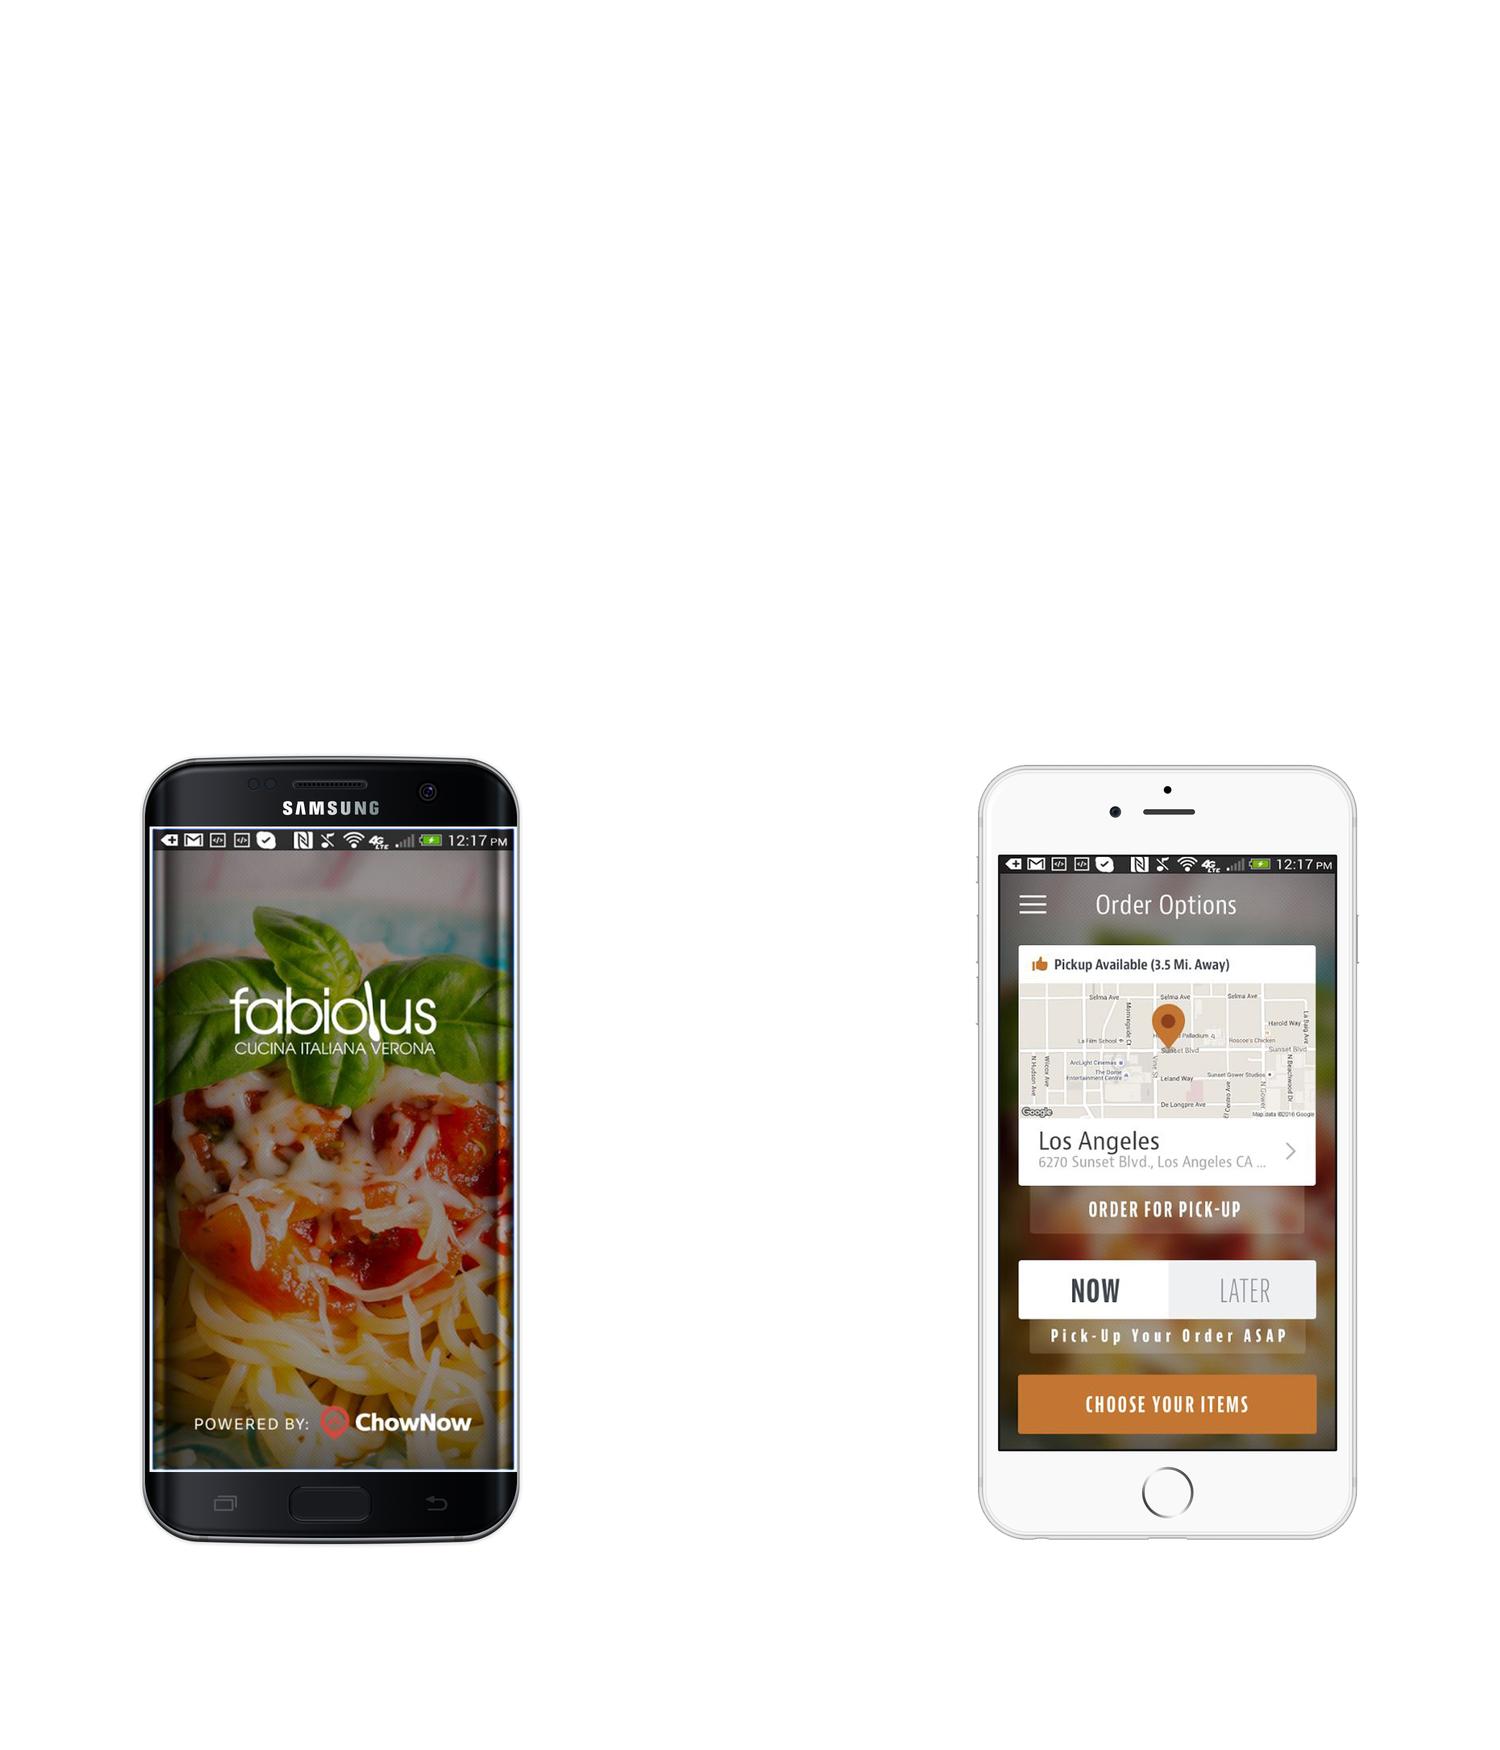 https://static1.squarespace.com/static/56c2dfb962cd9411ad02f2e6/5735141a01dbaec47dcf74f7/57351c5ae707eb8c6d568926/1463098474445/Samsung+Galaxy+S7+Edge+%26+iPhone+6s+-+Black+-+ChowNow+v2.jpg?format=1500w